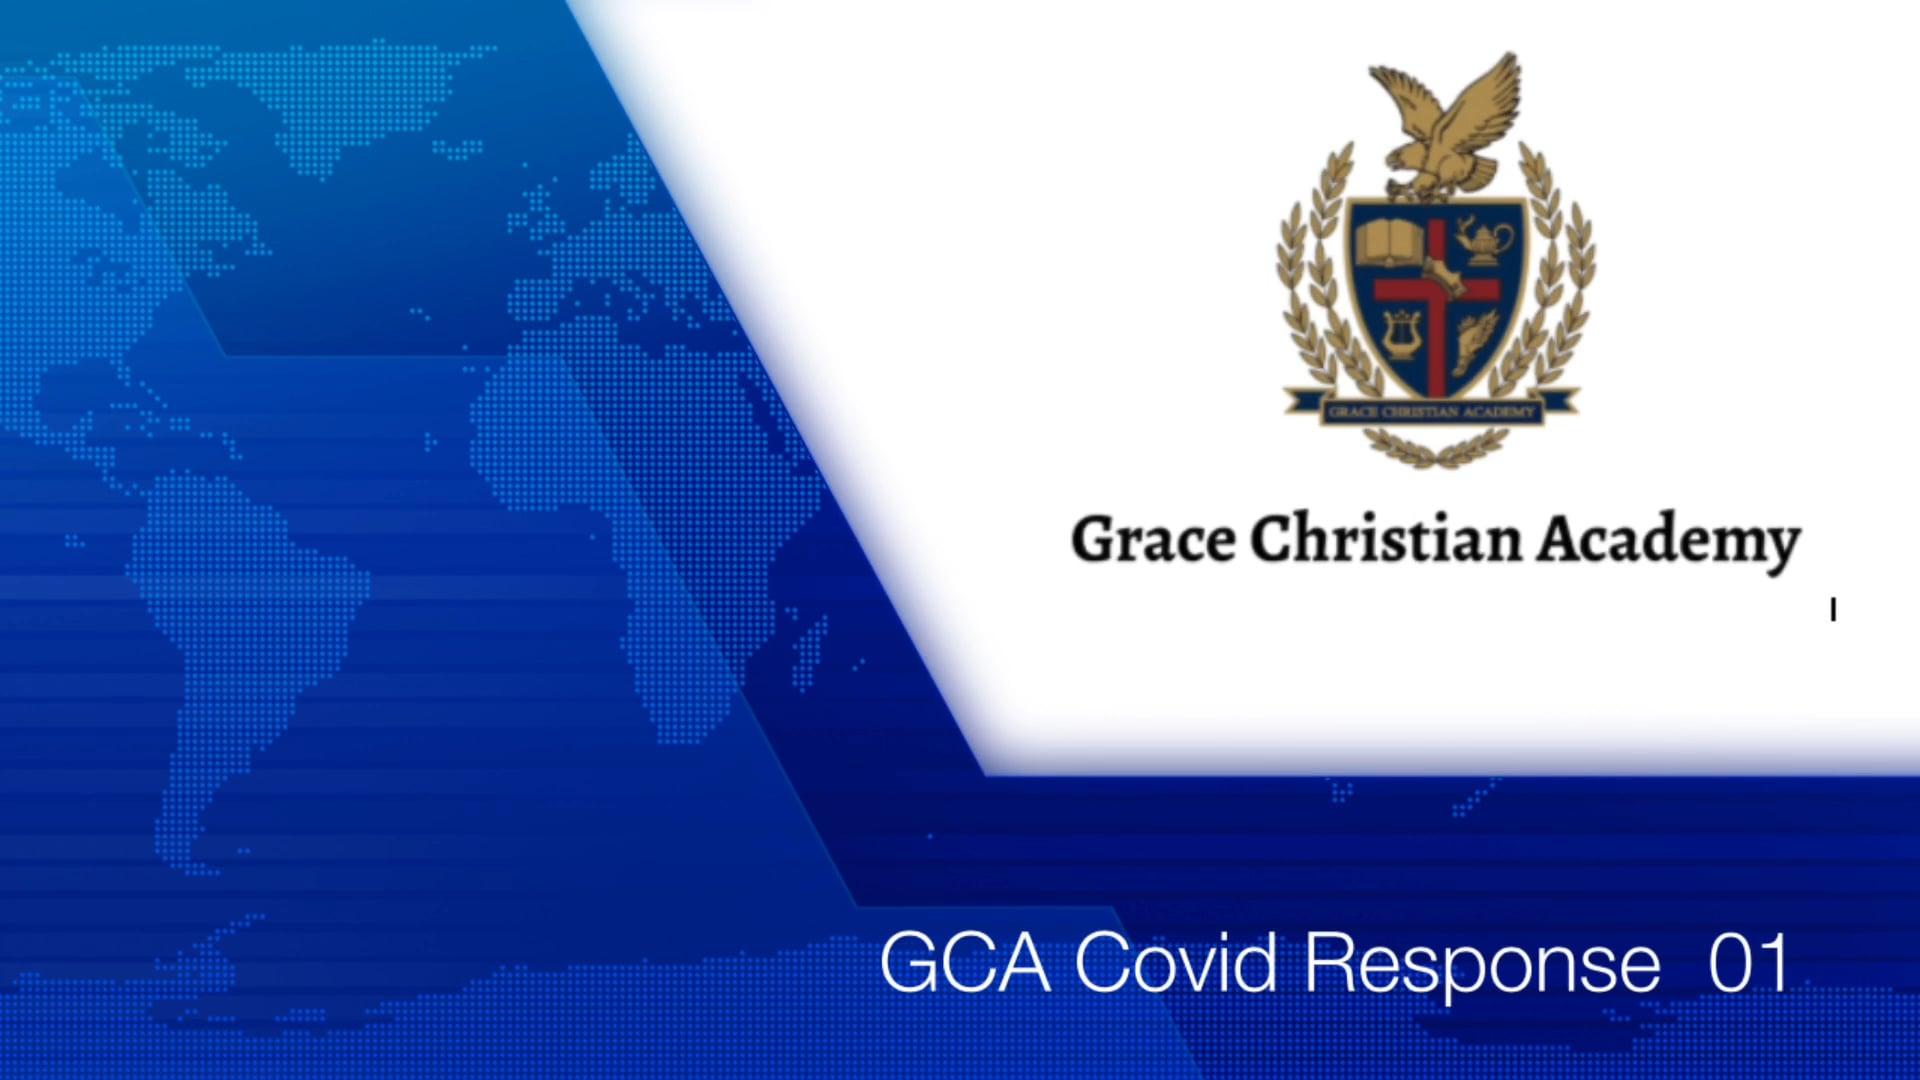 GCA Covid Response 01